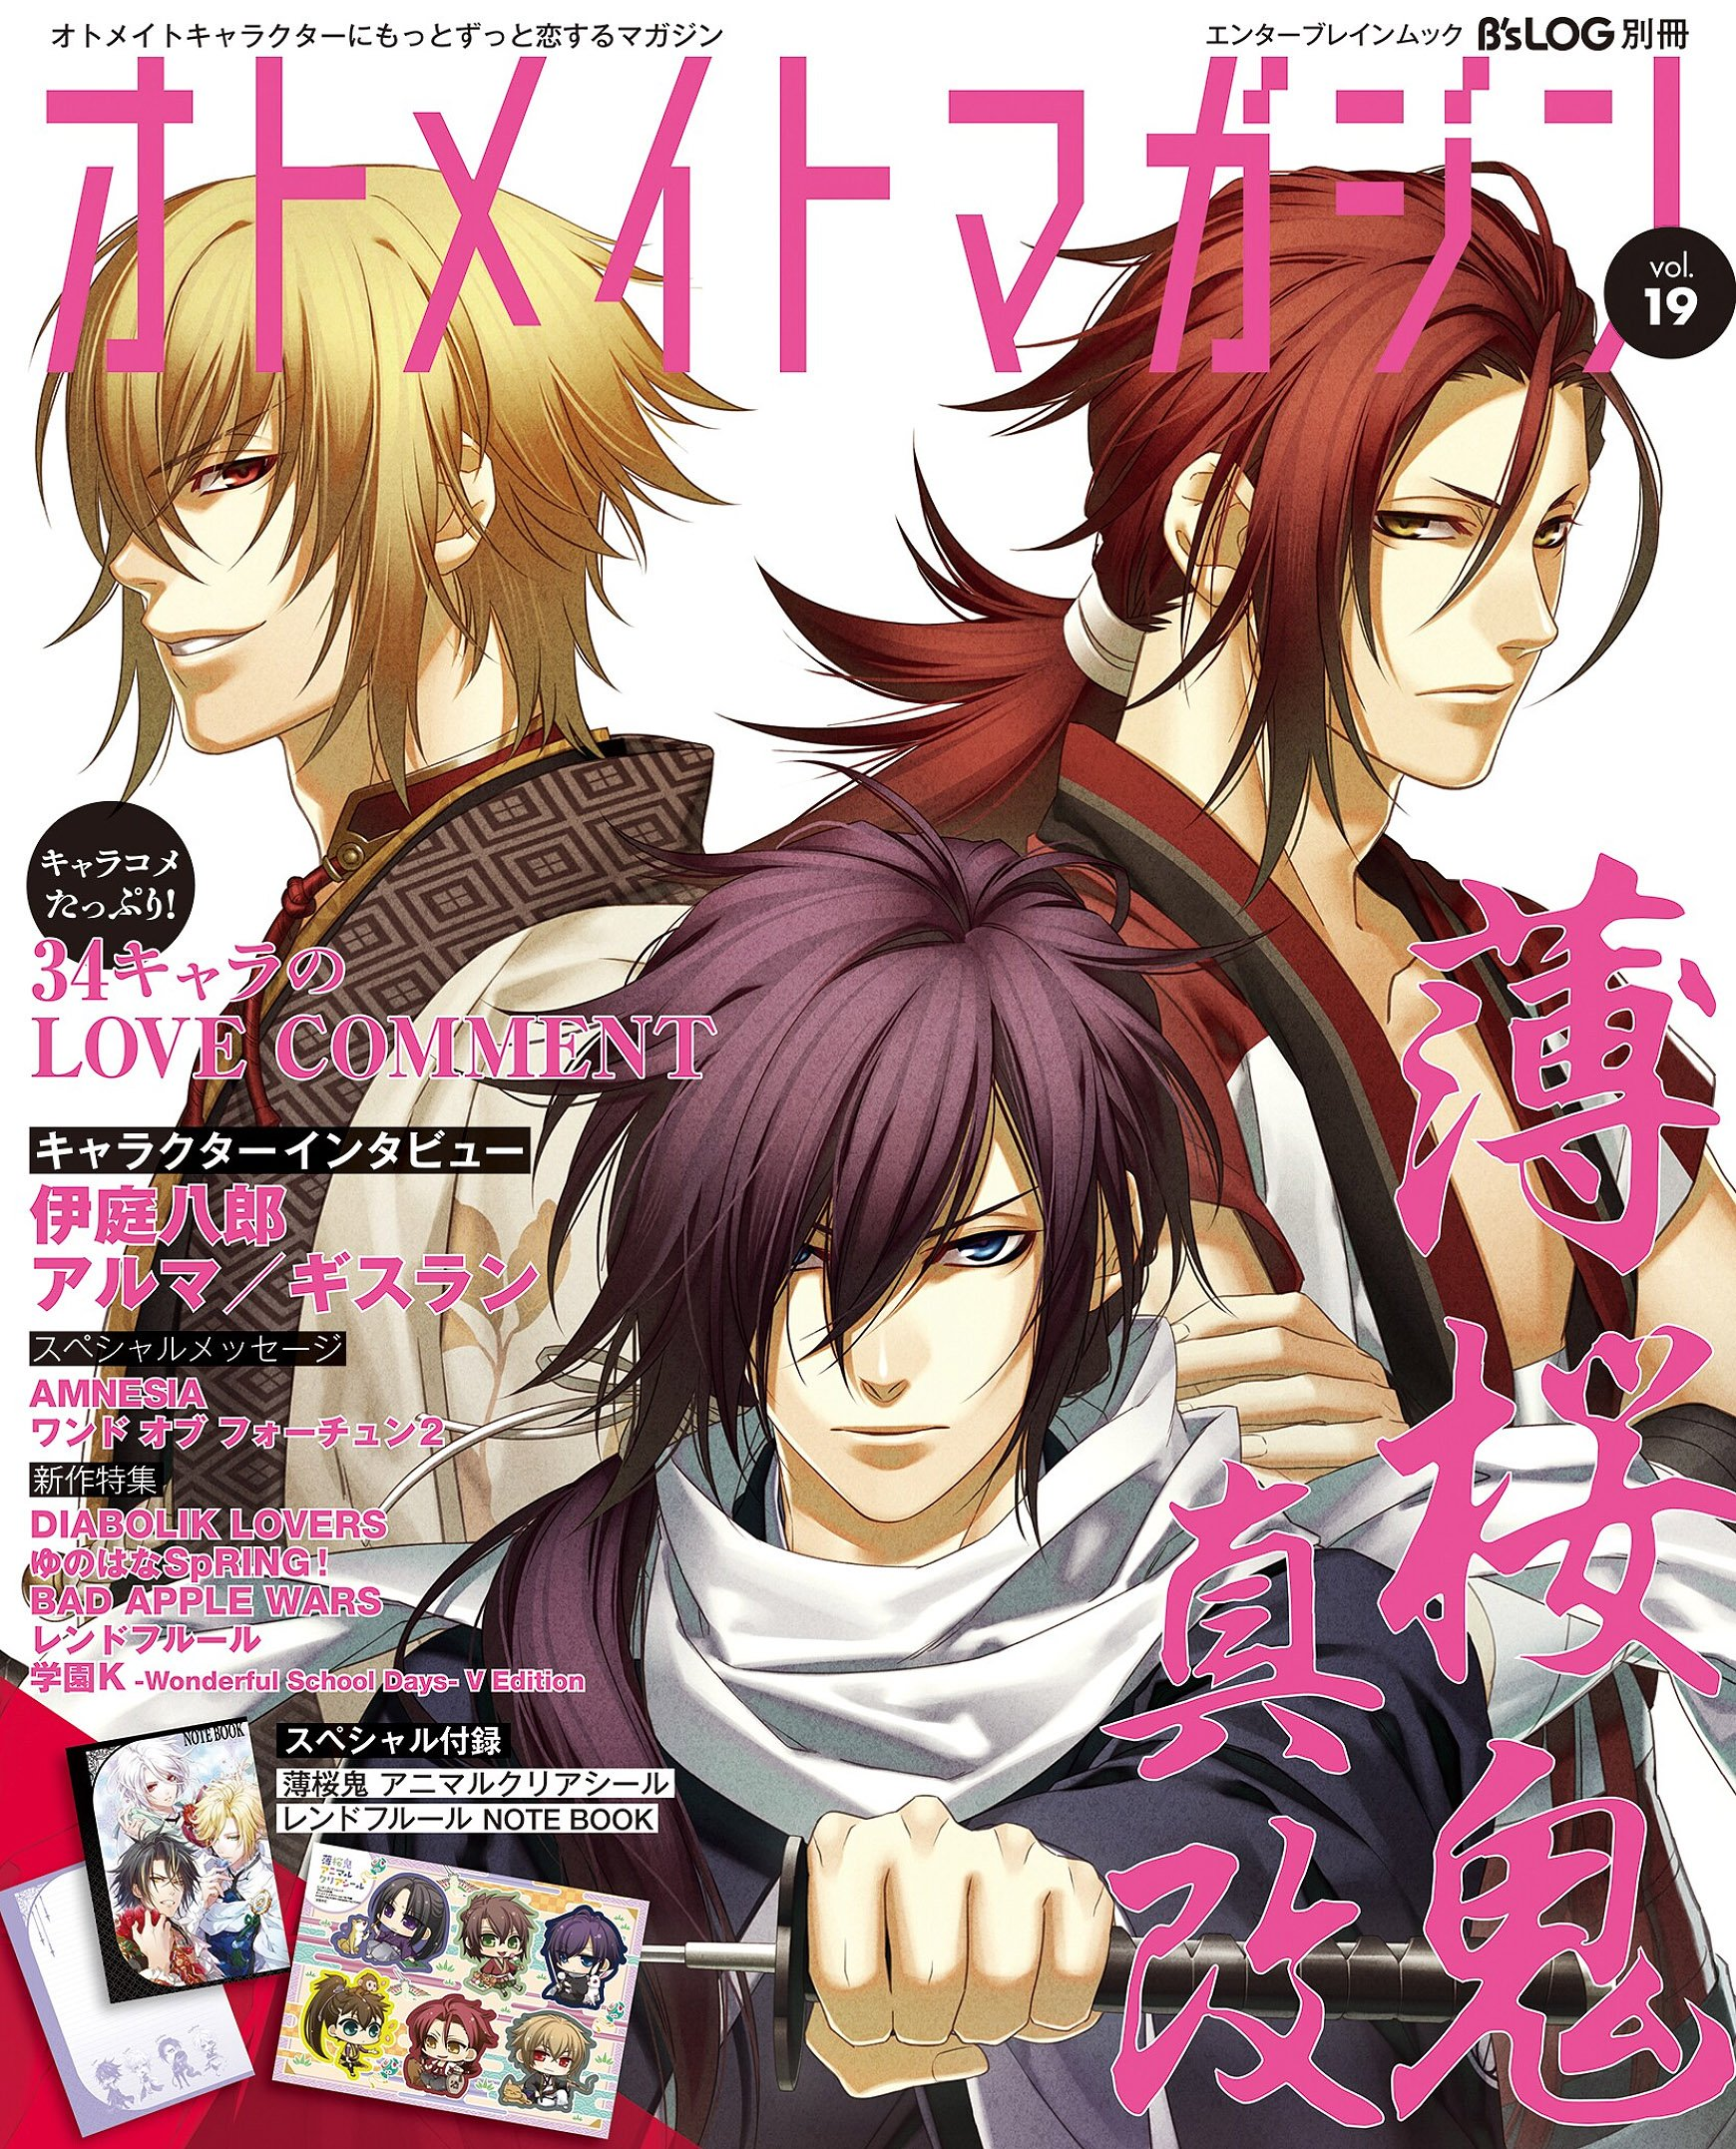 B's-LOG - Otomate Magazine Vol.19 (October 2015)